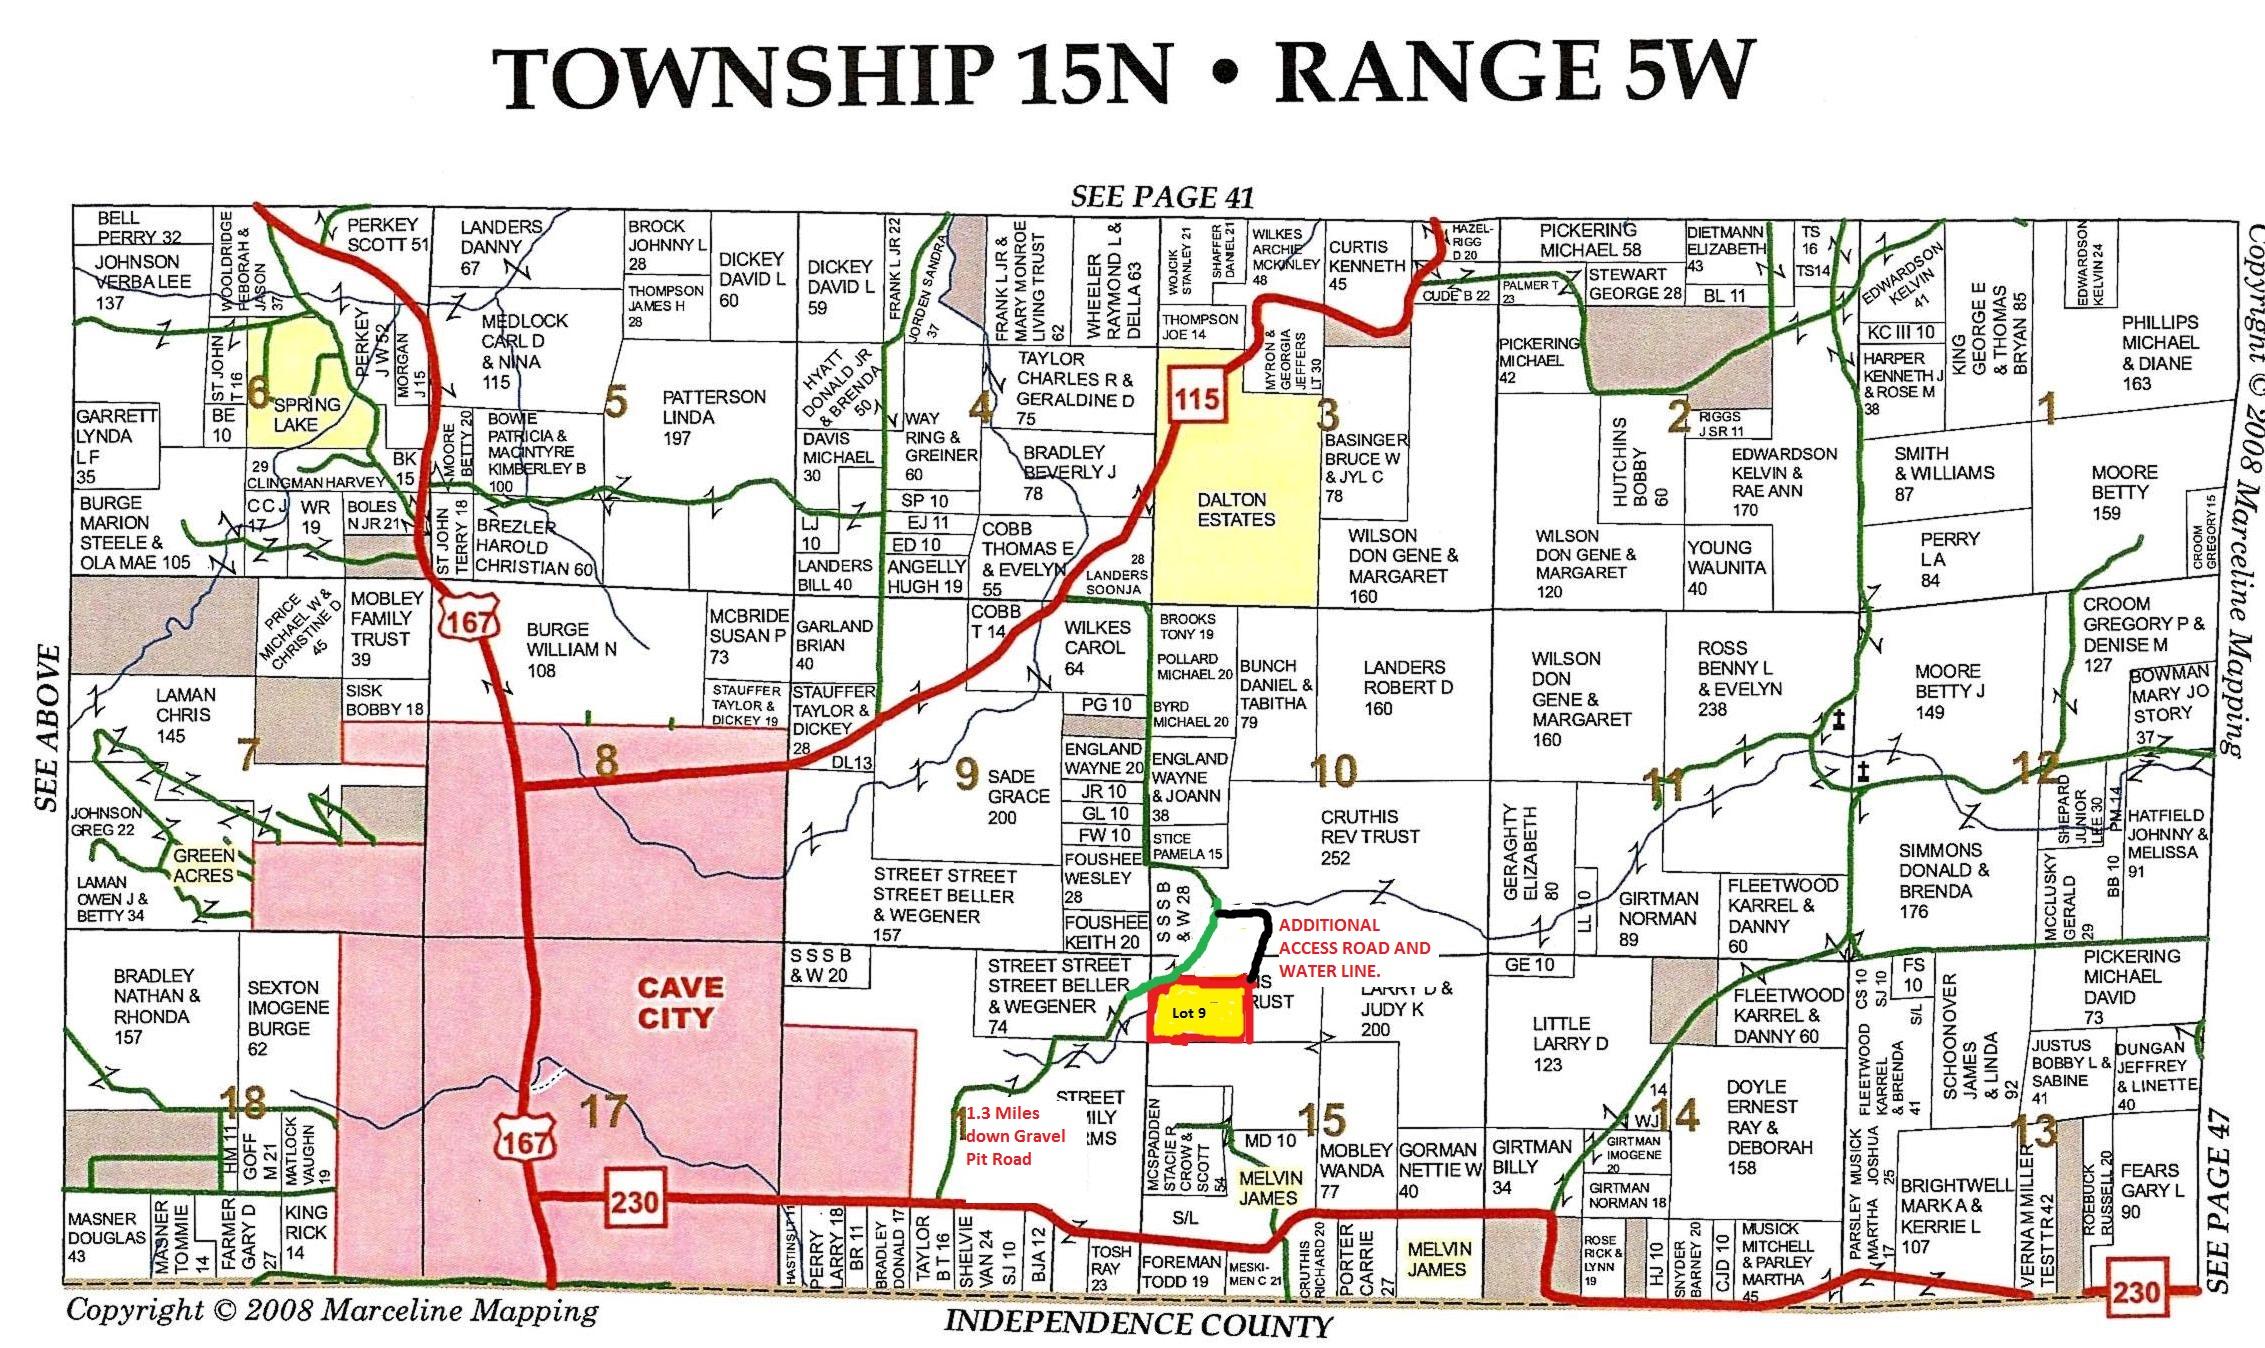 Acres In Sharp County Arkansas - Arkansas land ownership maps